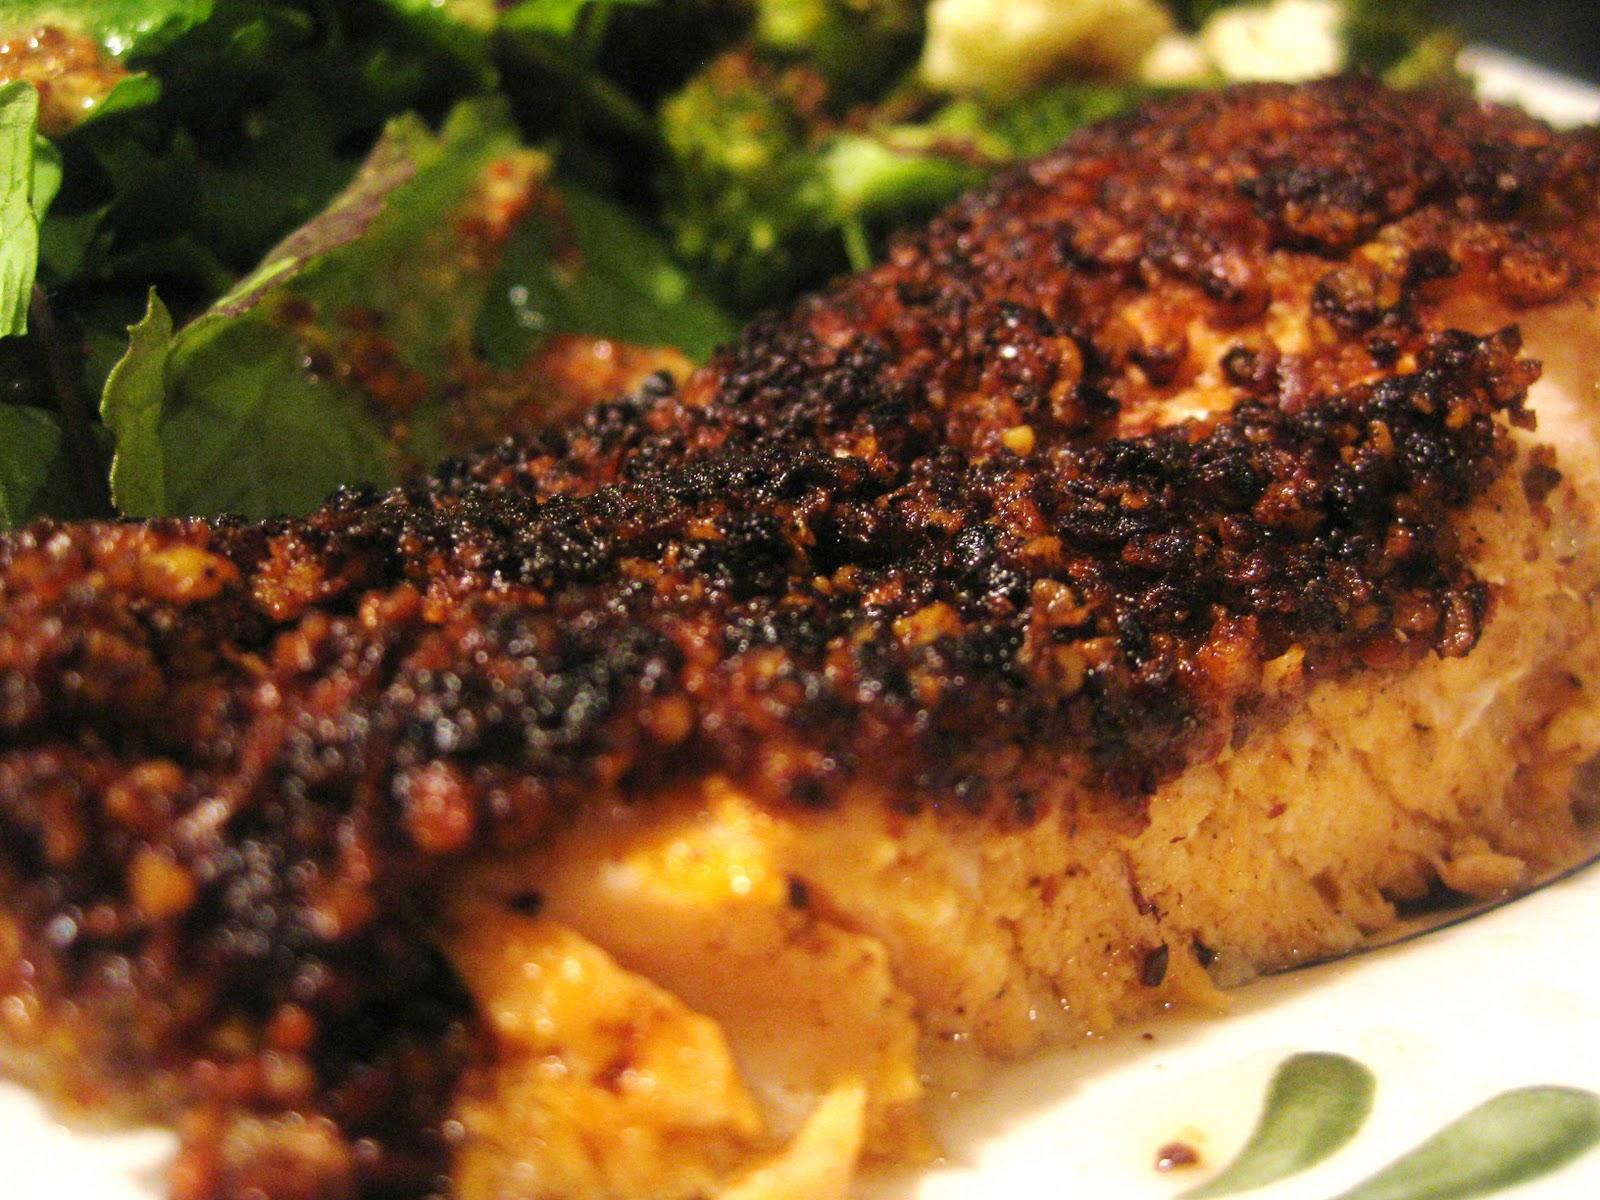 Gluten-free Cinnamon and Pecan Crusted Salmon